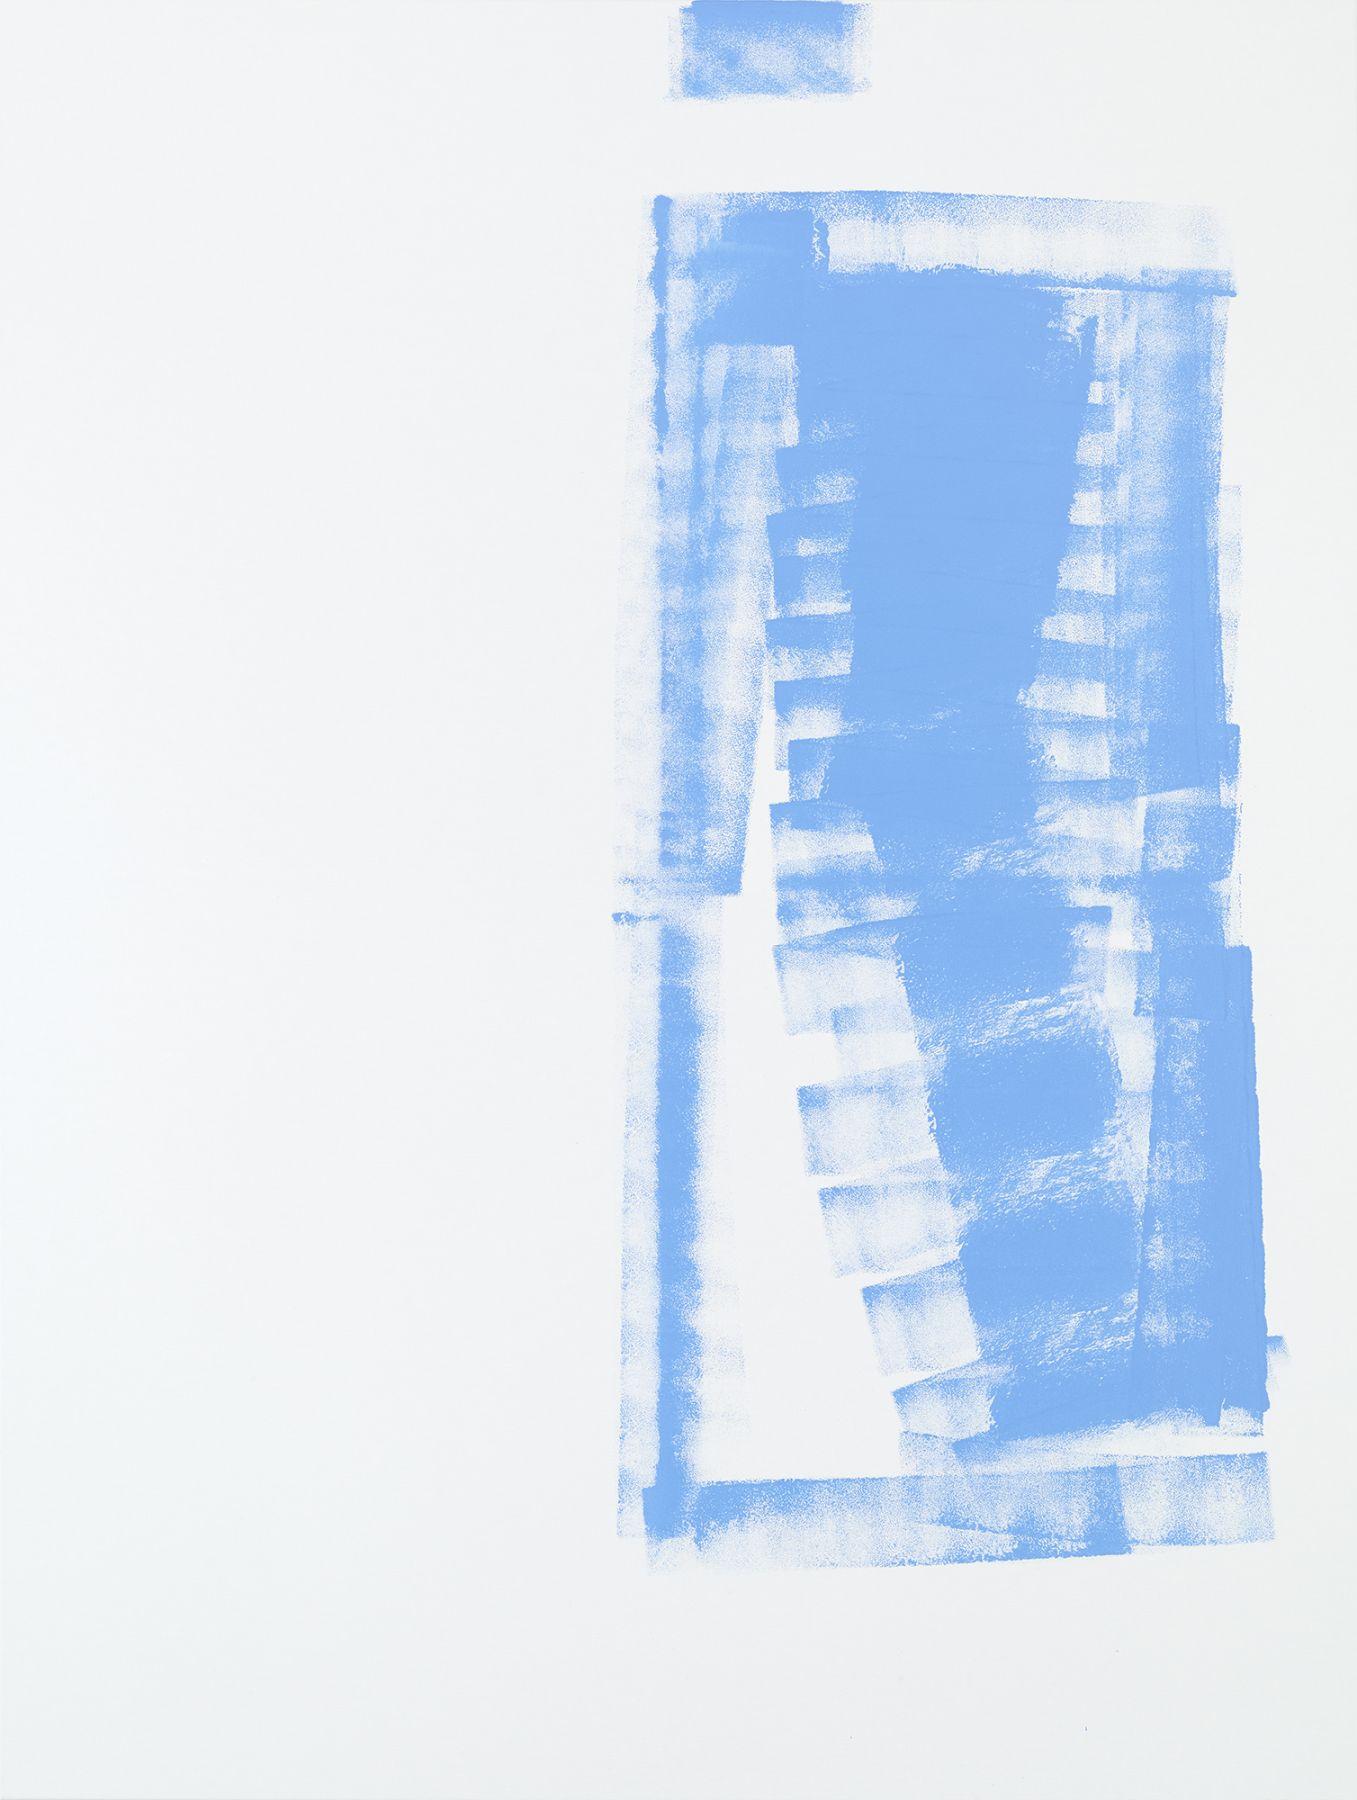 Michael Krebber MK.292, 2015 Acrylic on canvas 78 3/4 x 59 1/8 inches (200 x 150.2 cm)